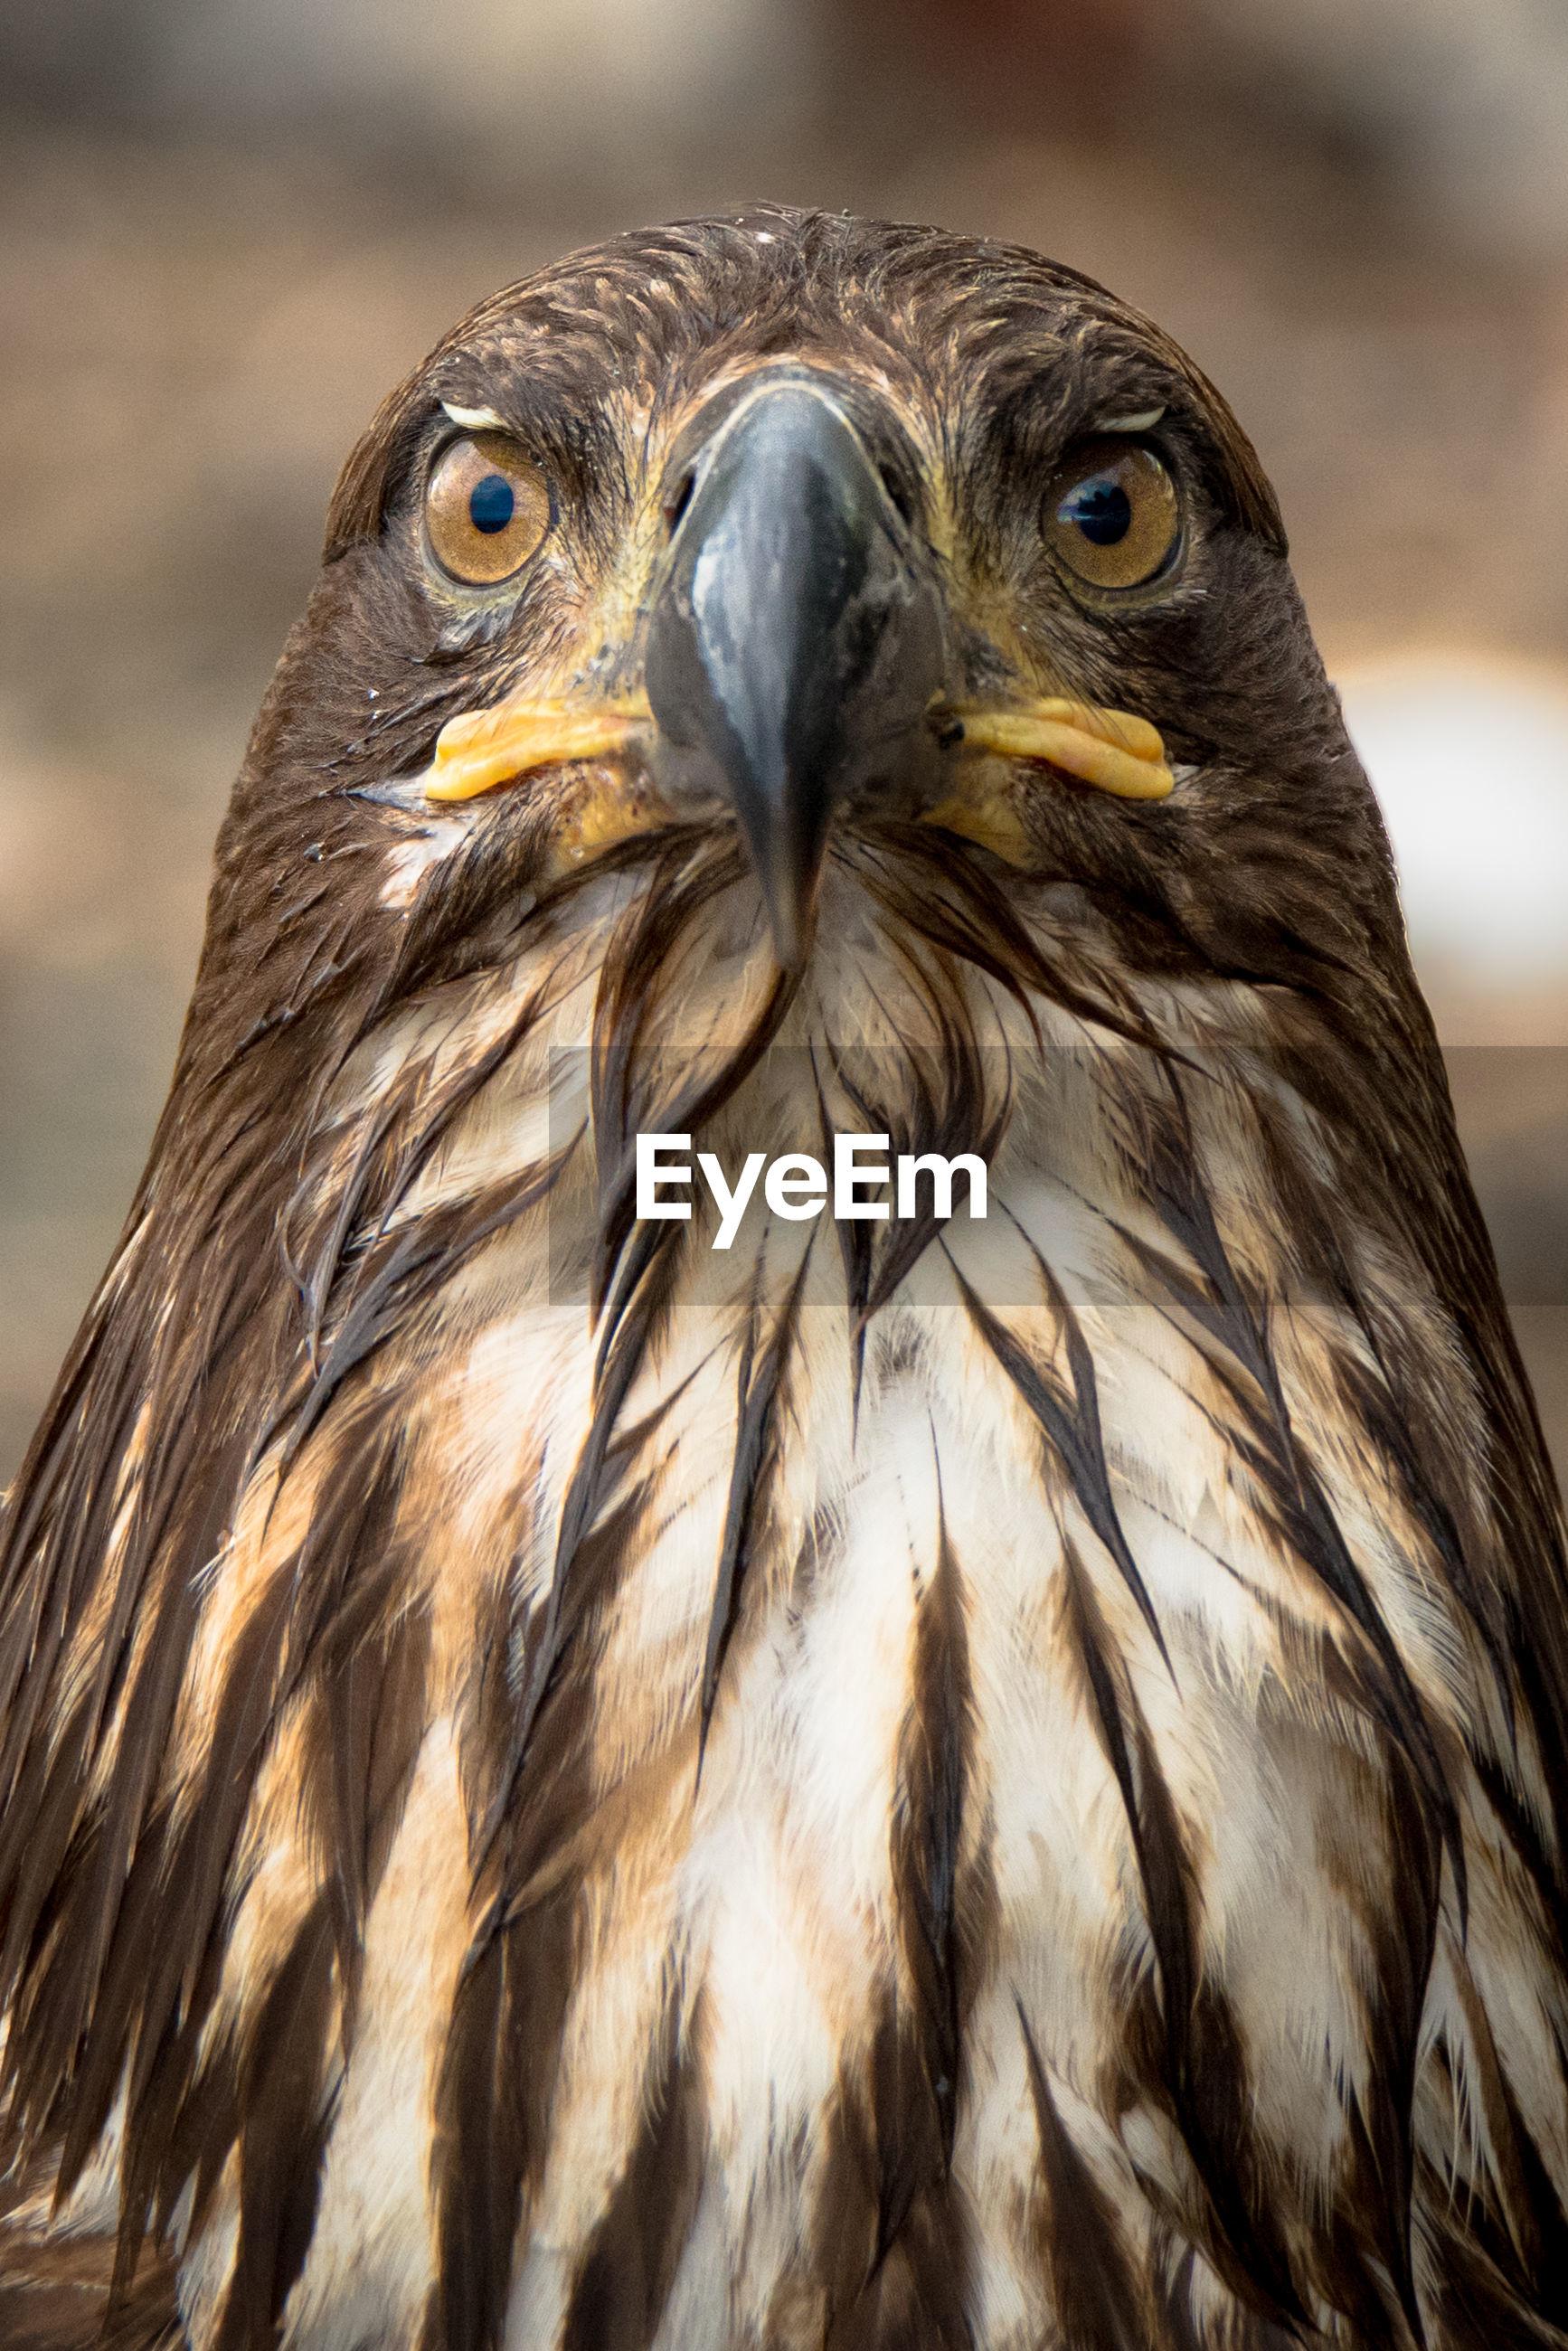 PORTRAIT OF OWL